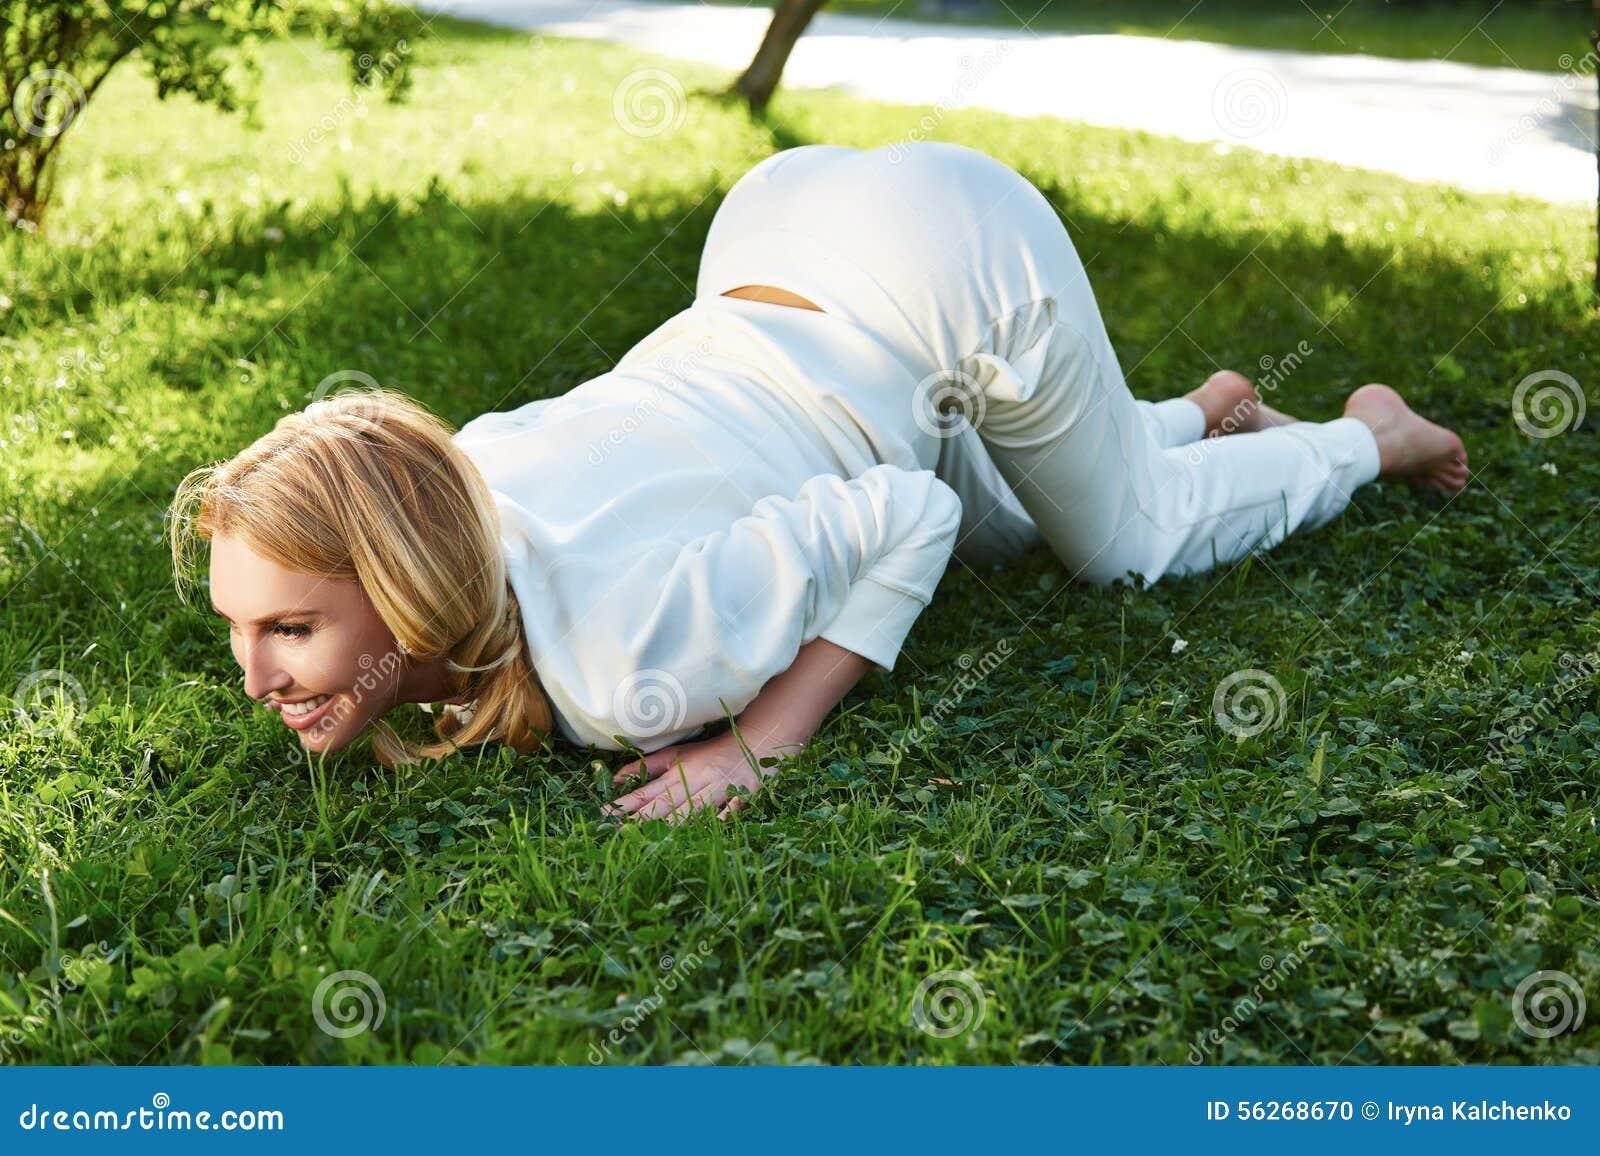 beautiful woman sport gymnastics green park nature summer